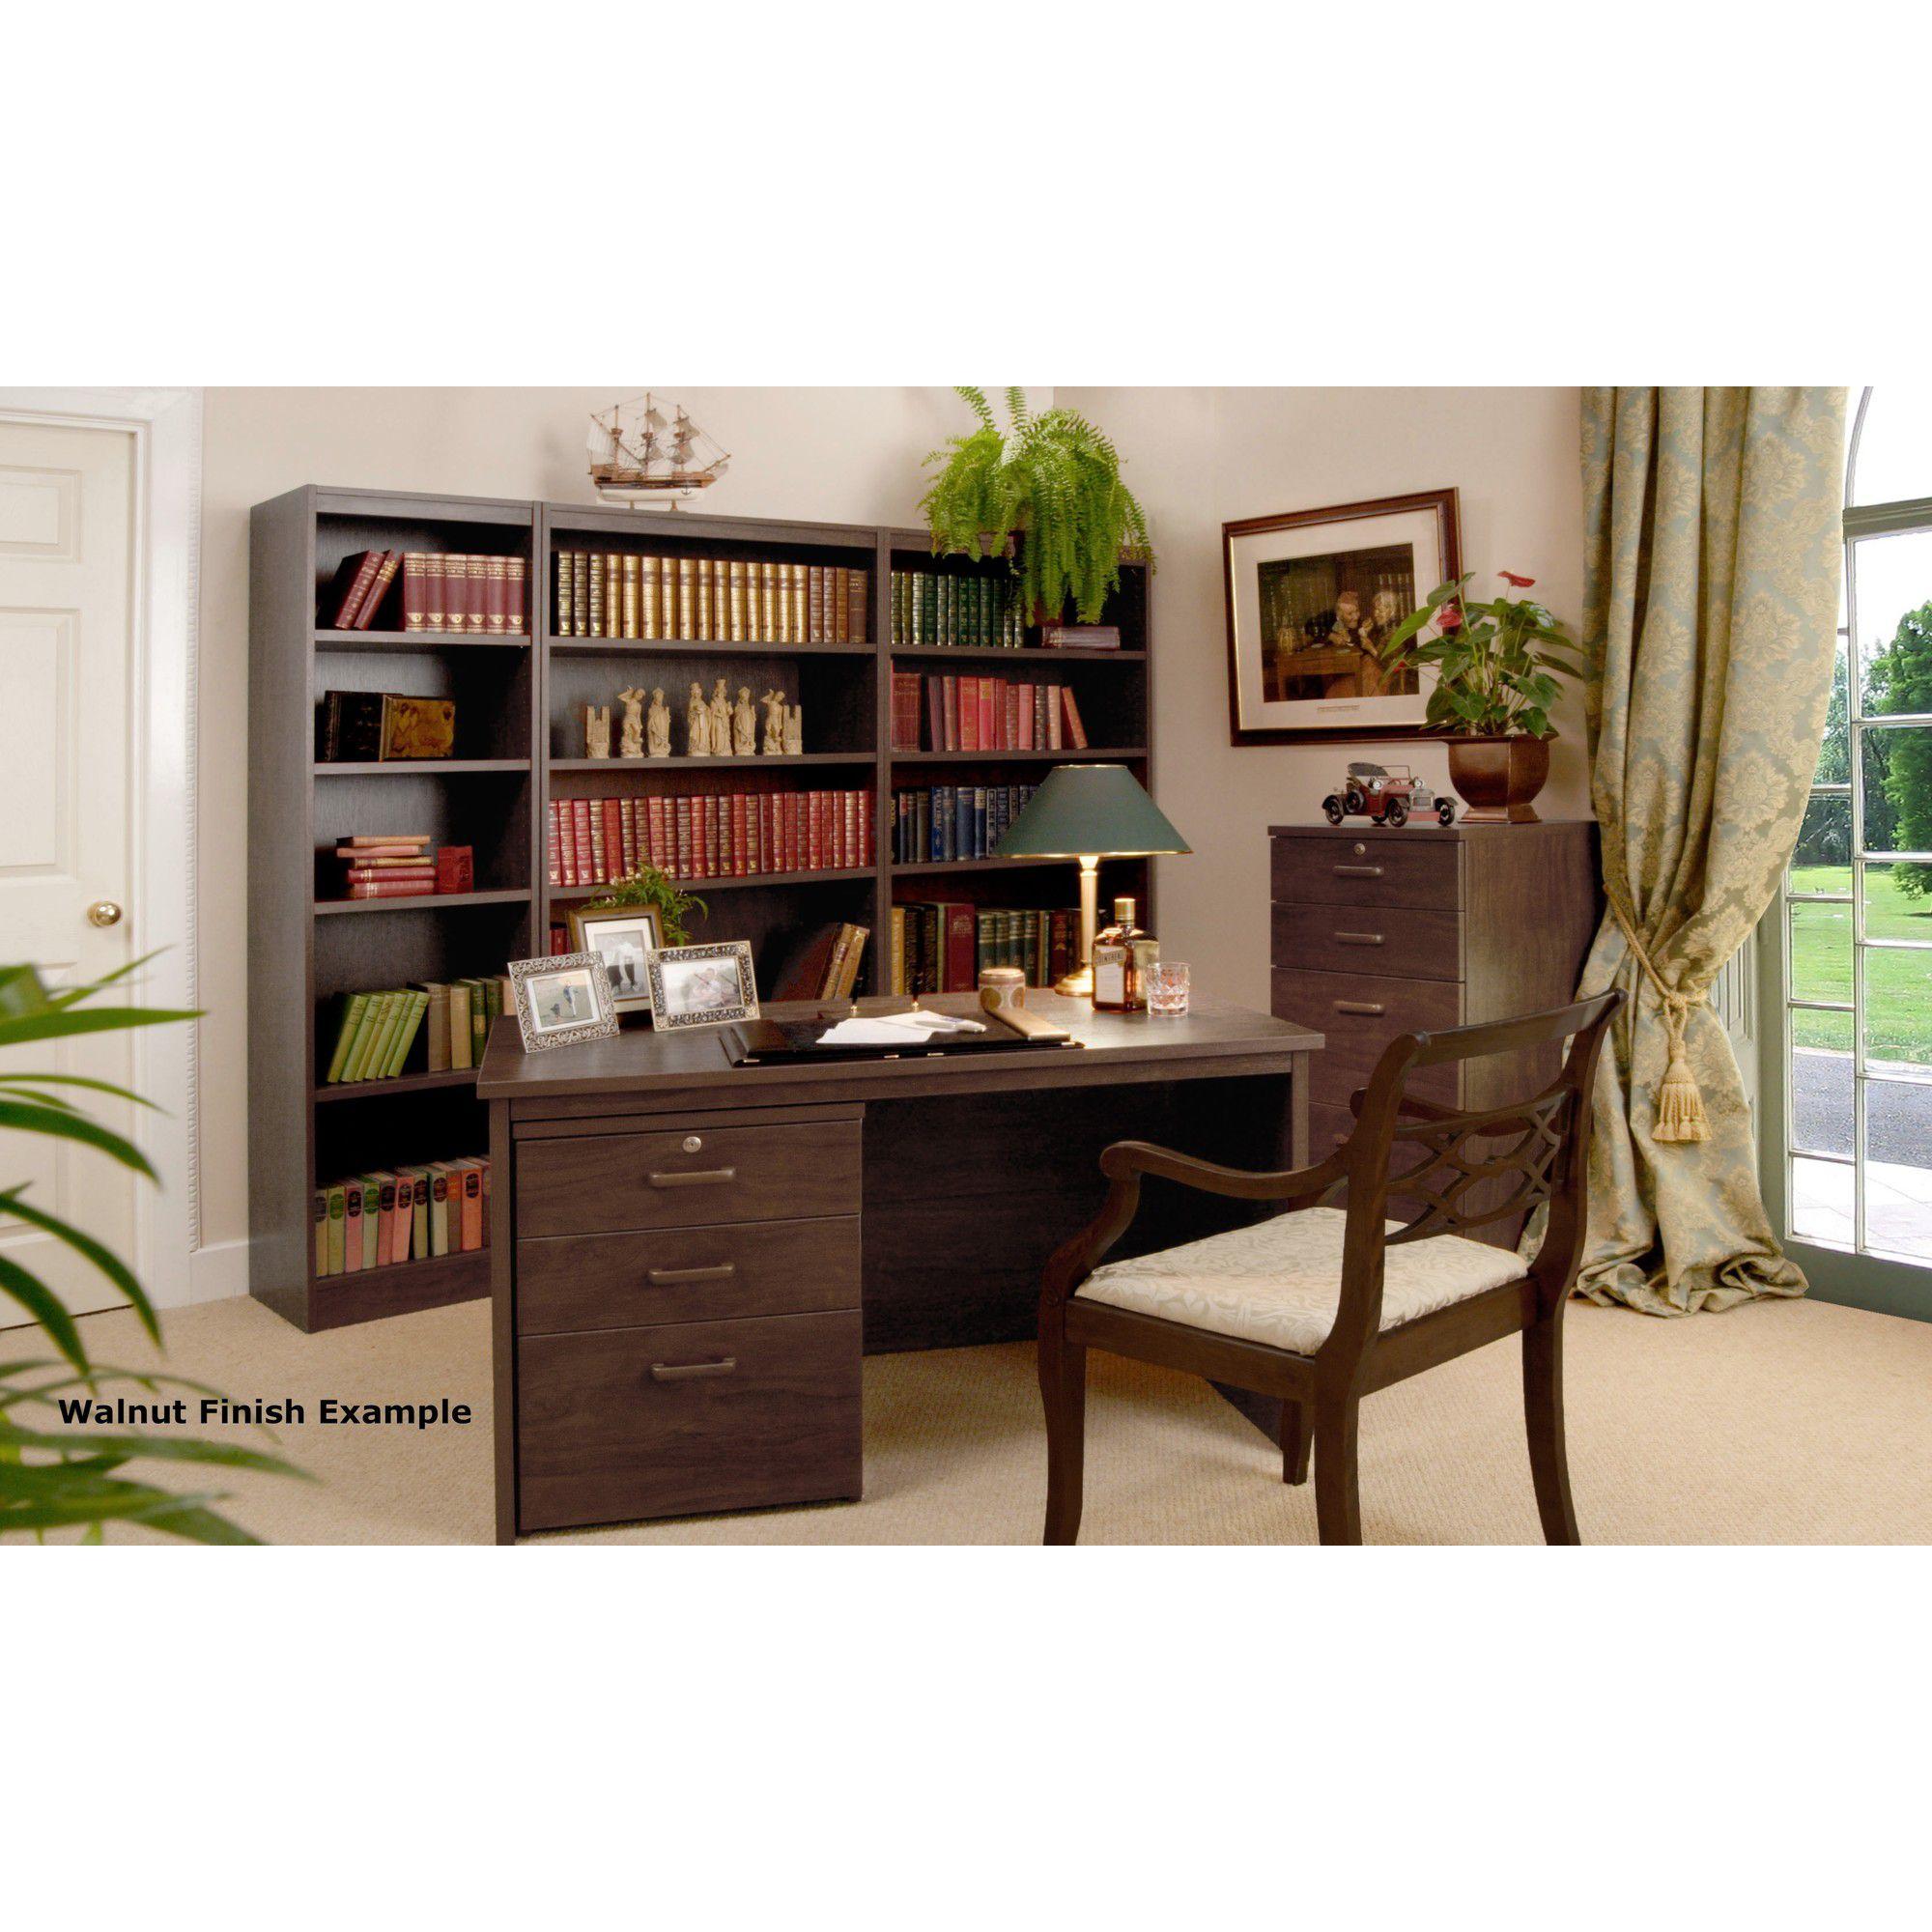 Enduro Four Drawer Tall Wooden Filing Cabinet - English Oak at Tesco Direct